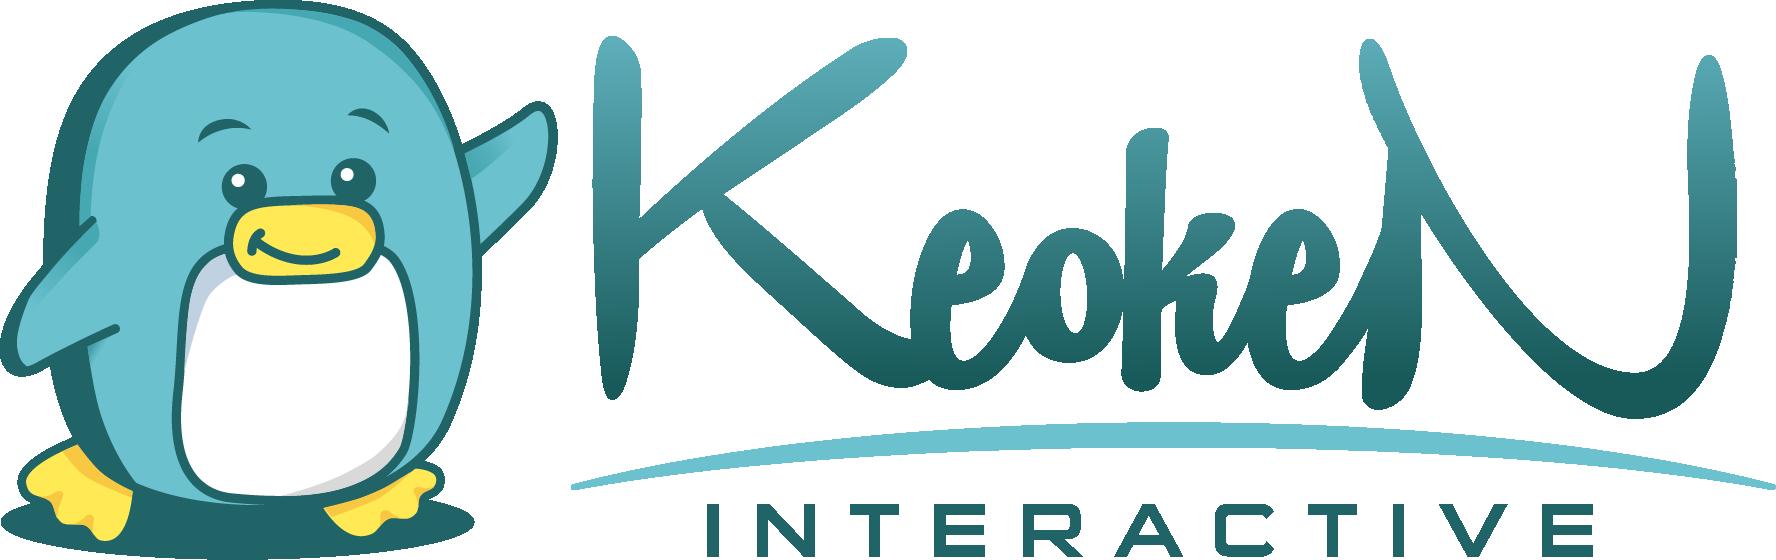 Keoken Interactive logo.png